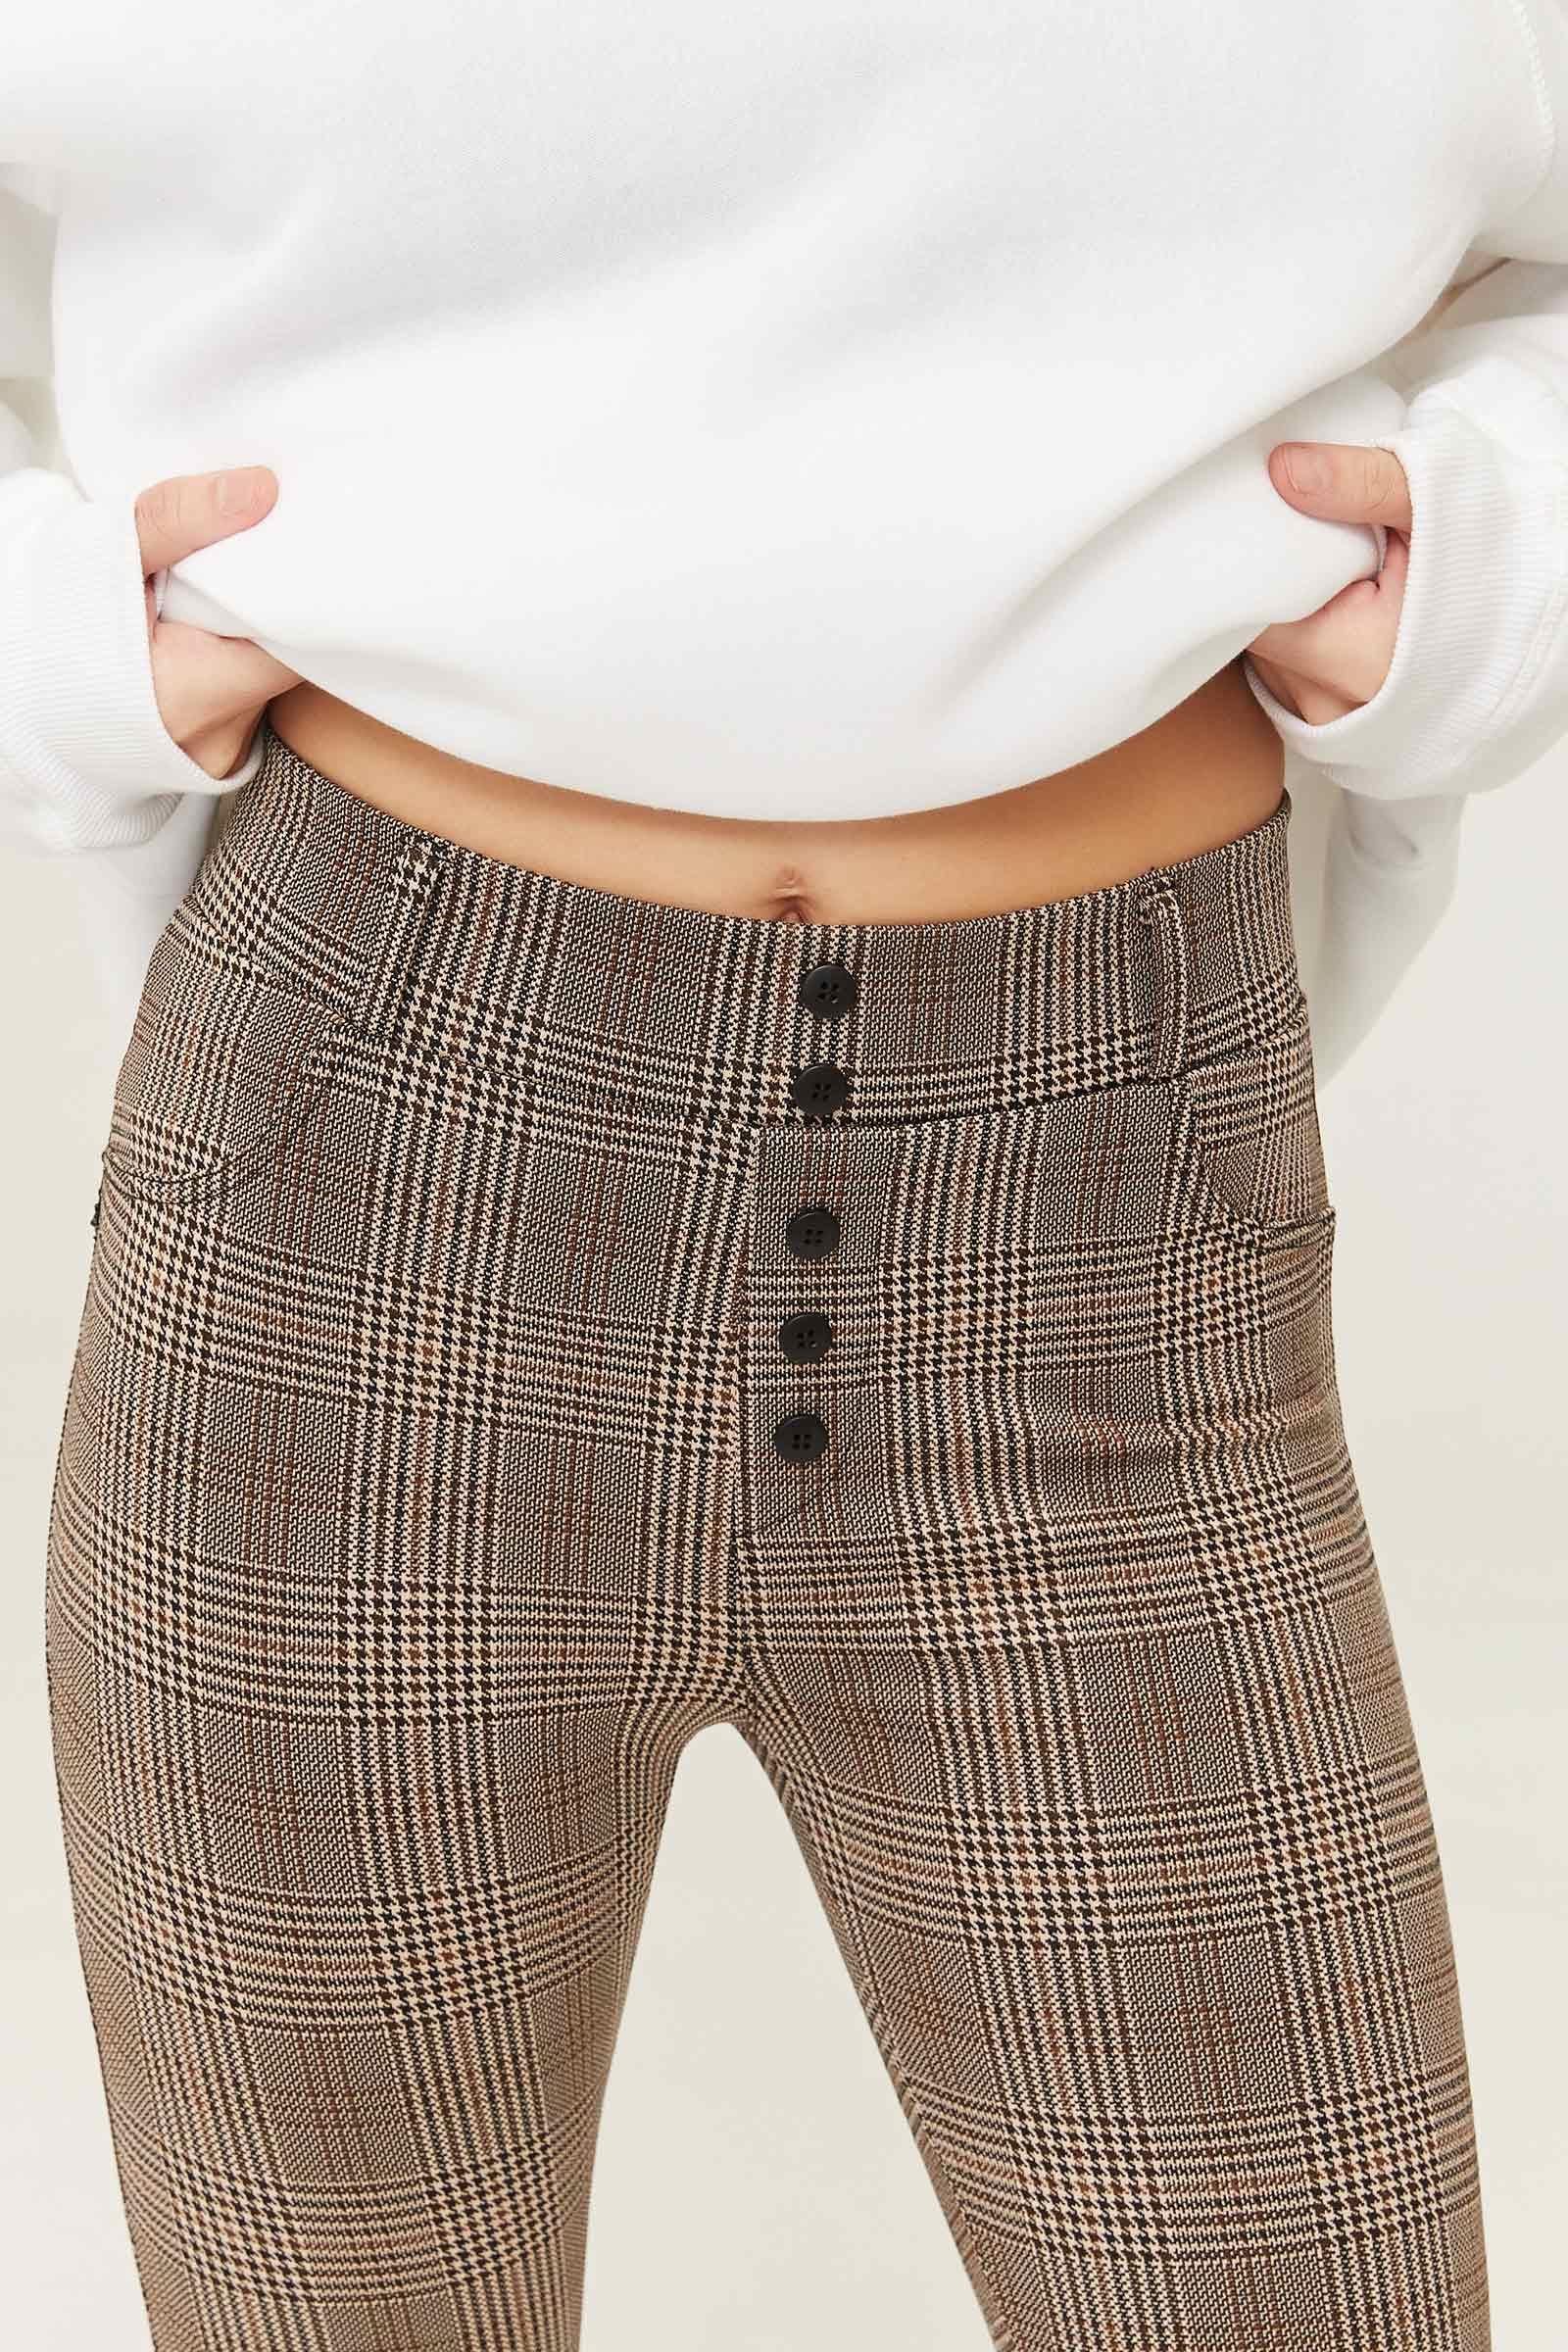 Buttoned Plaid Leggings